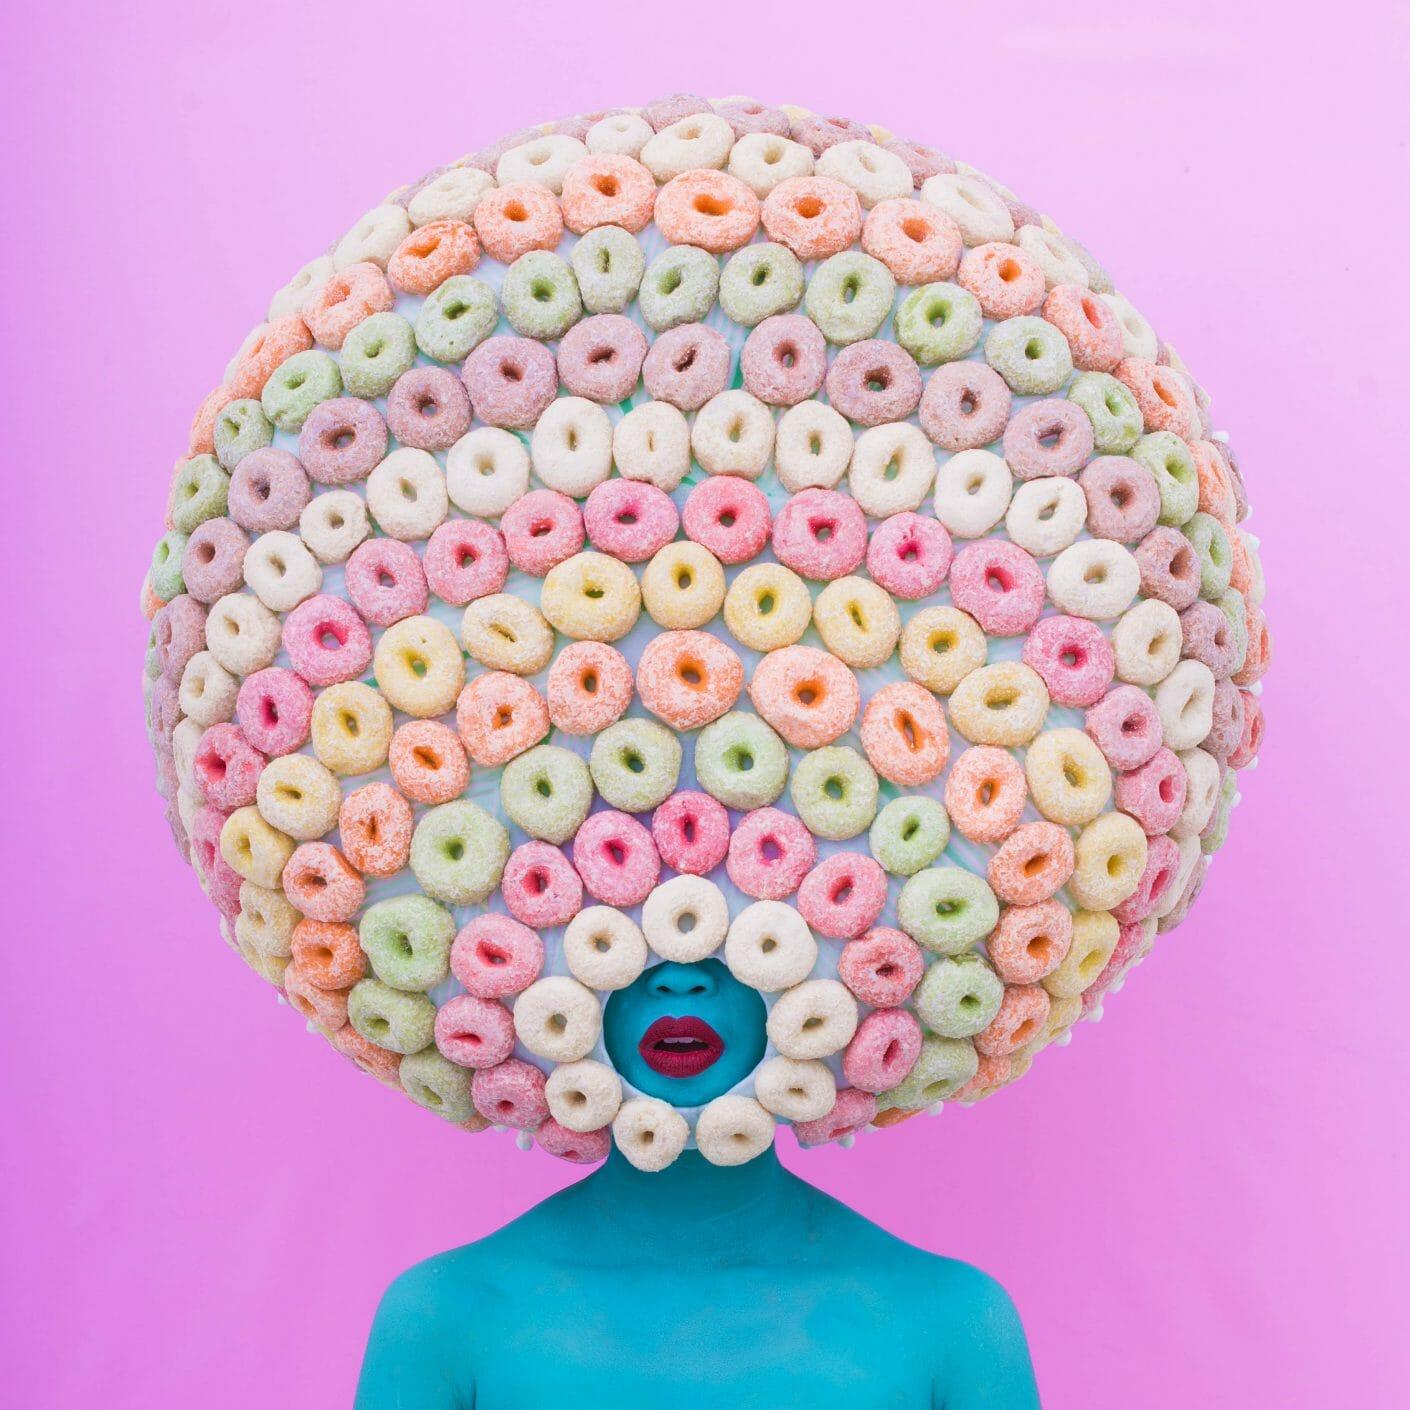 Enora LALET - Tata Boga portrait donut